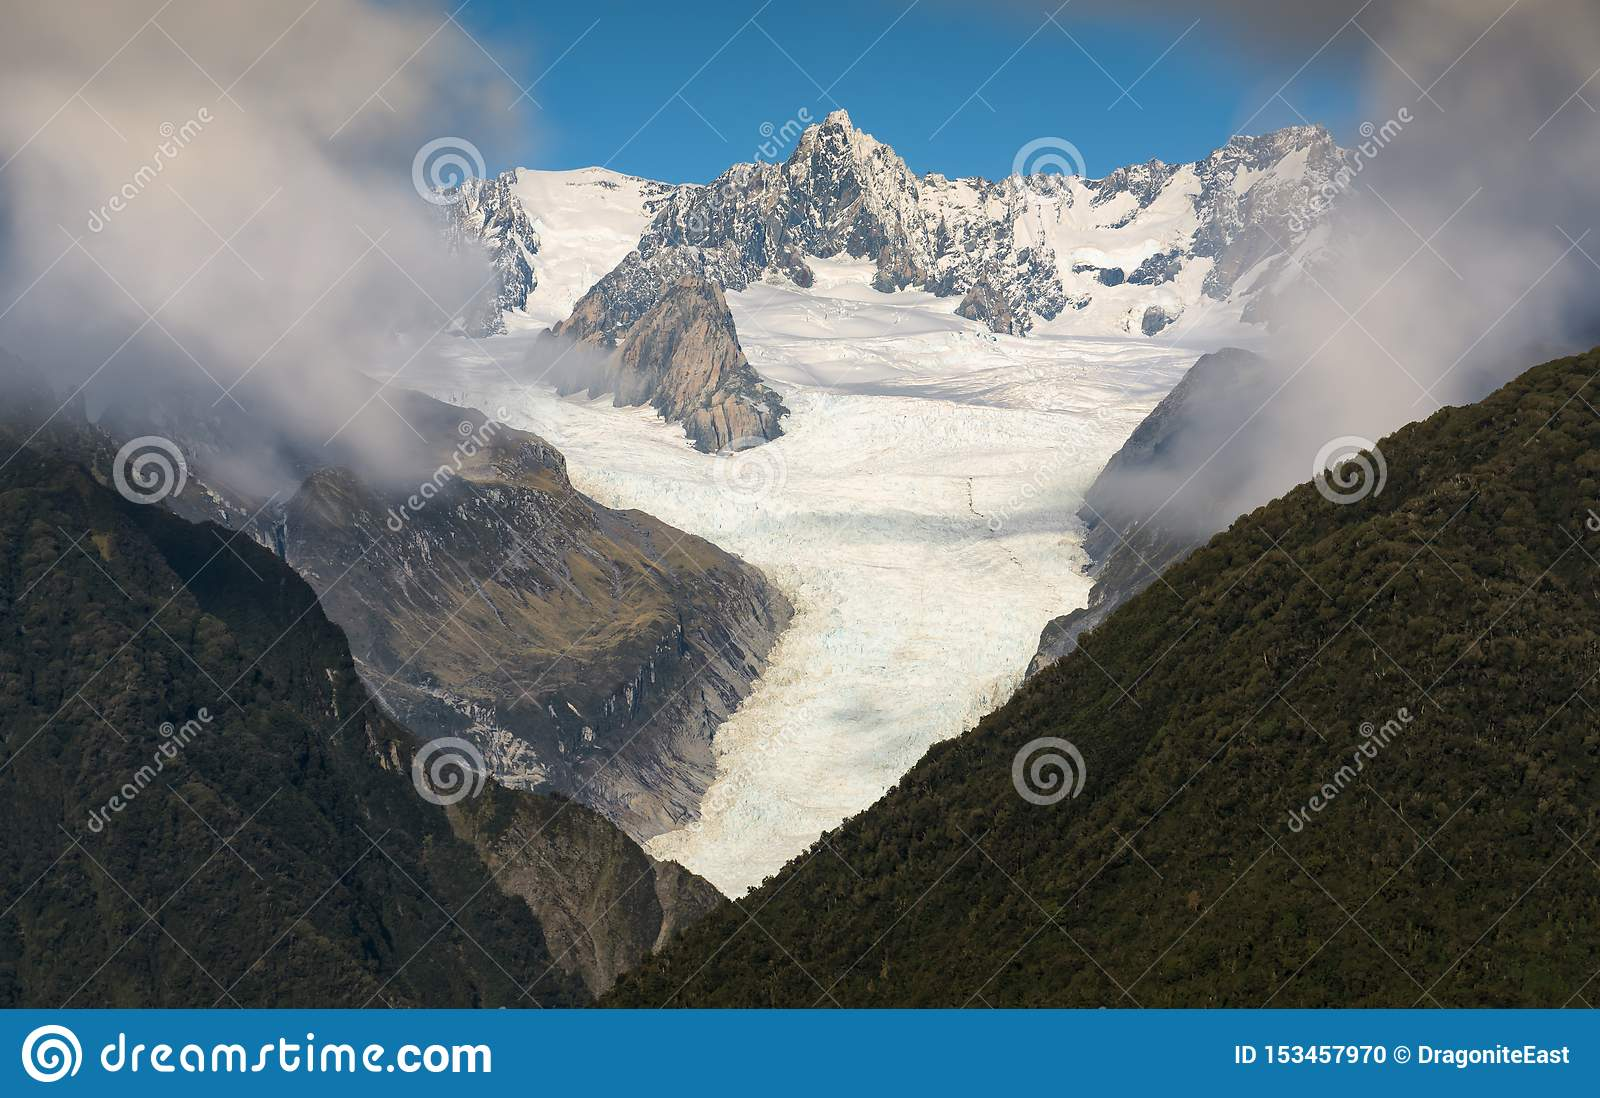 Fox冰川新西兰风景山风景